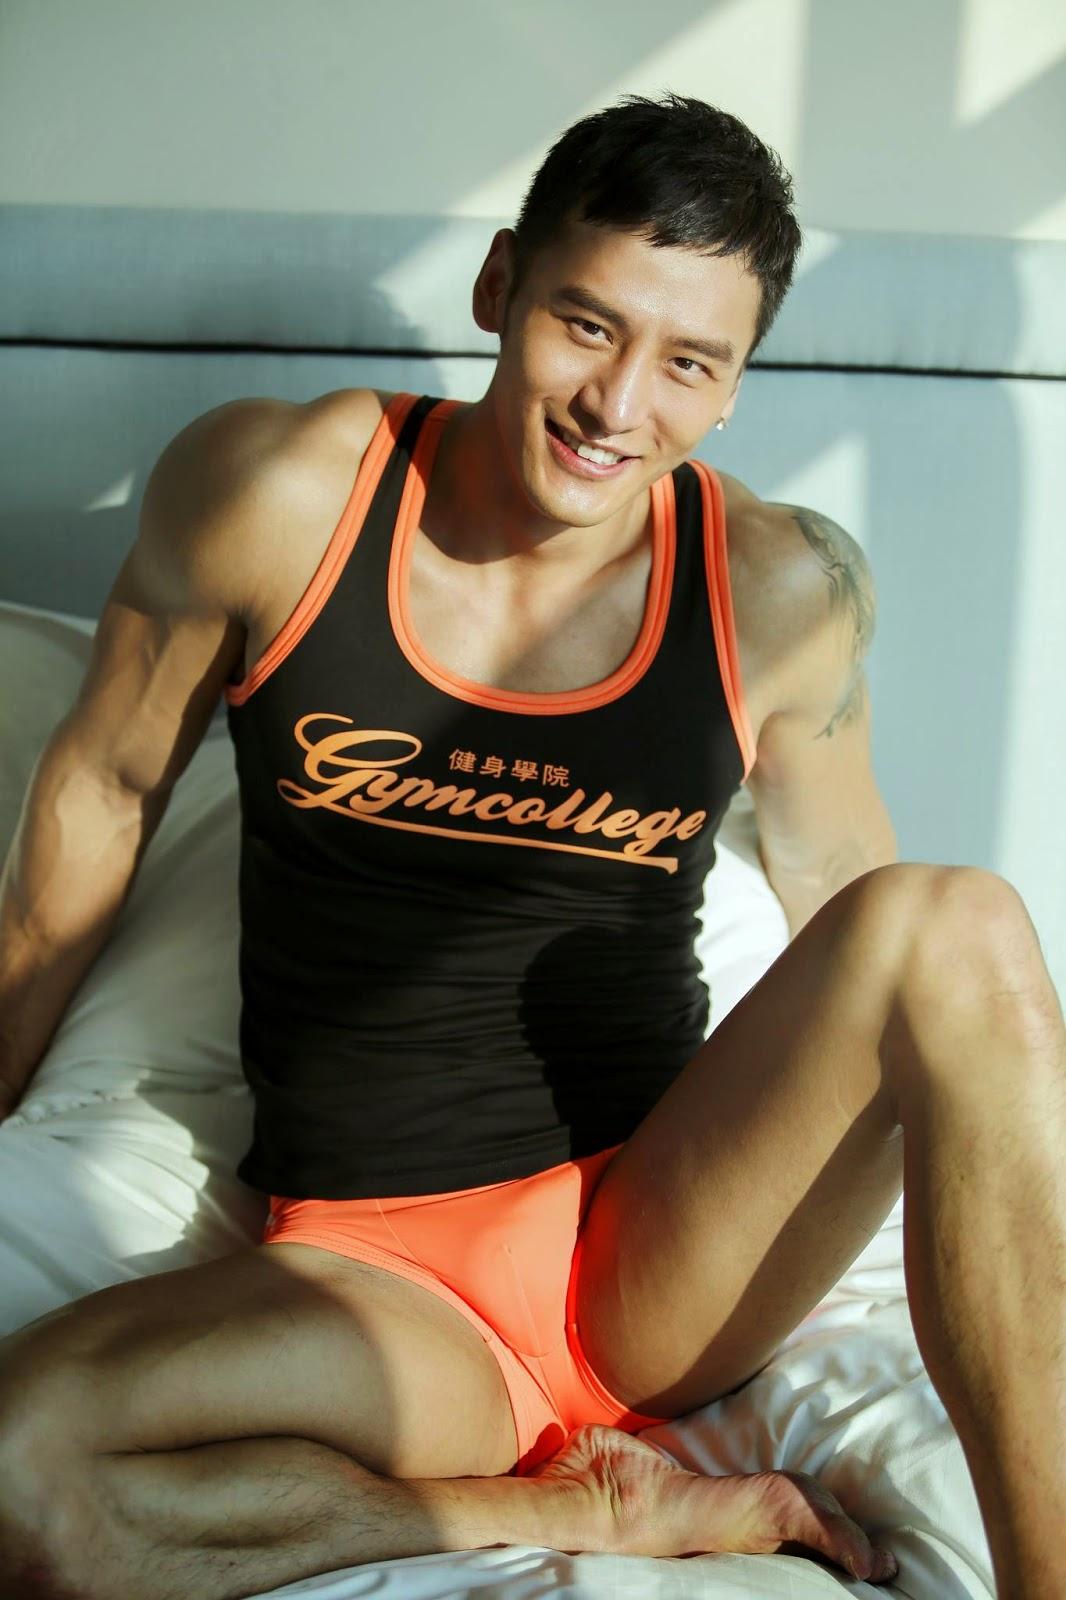 http://gayasiancollection.com/hot-asian-hunk-gu/